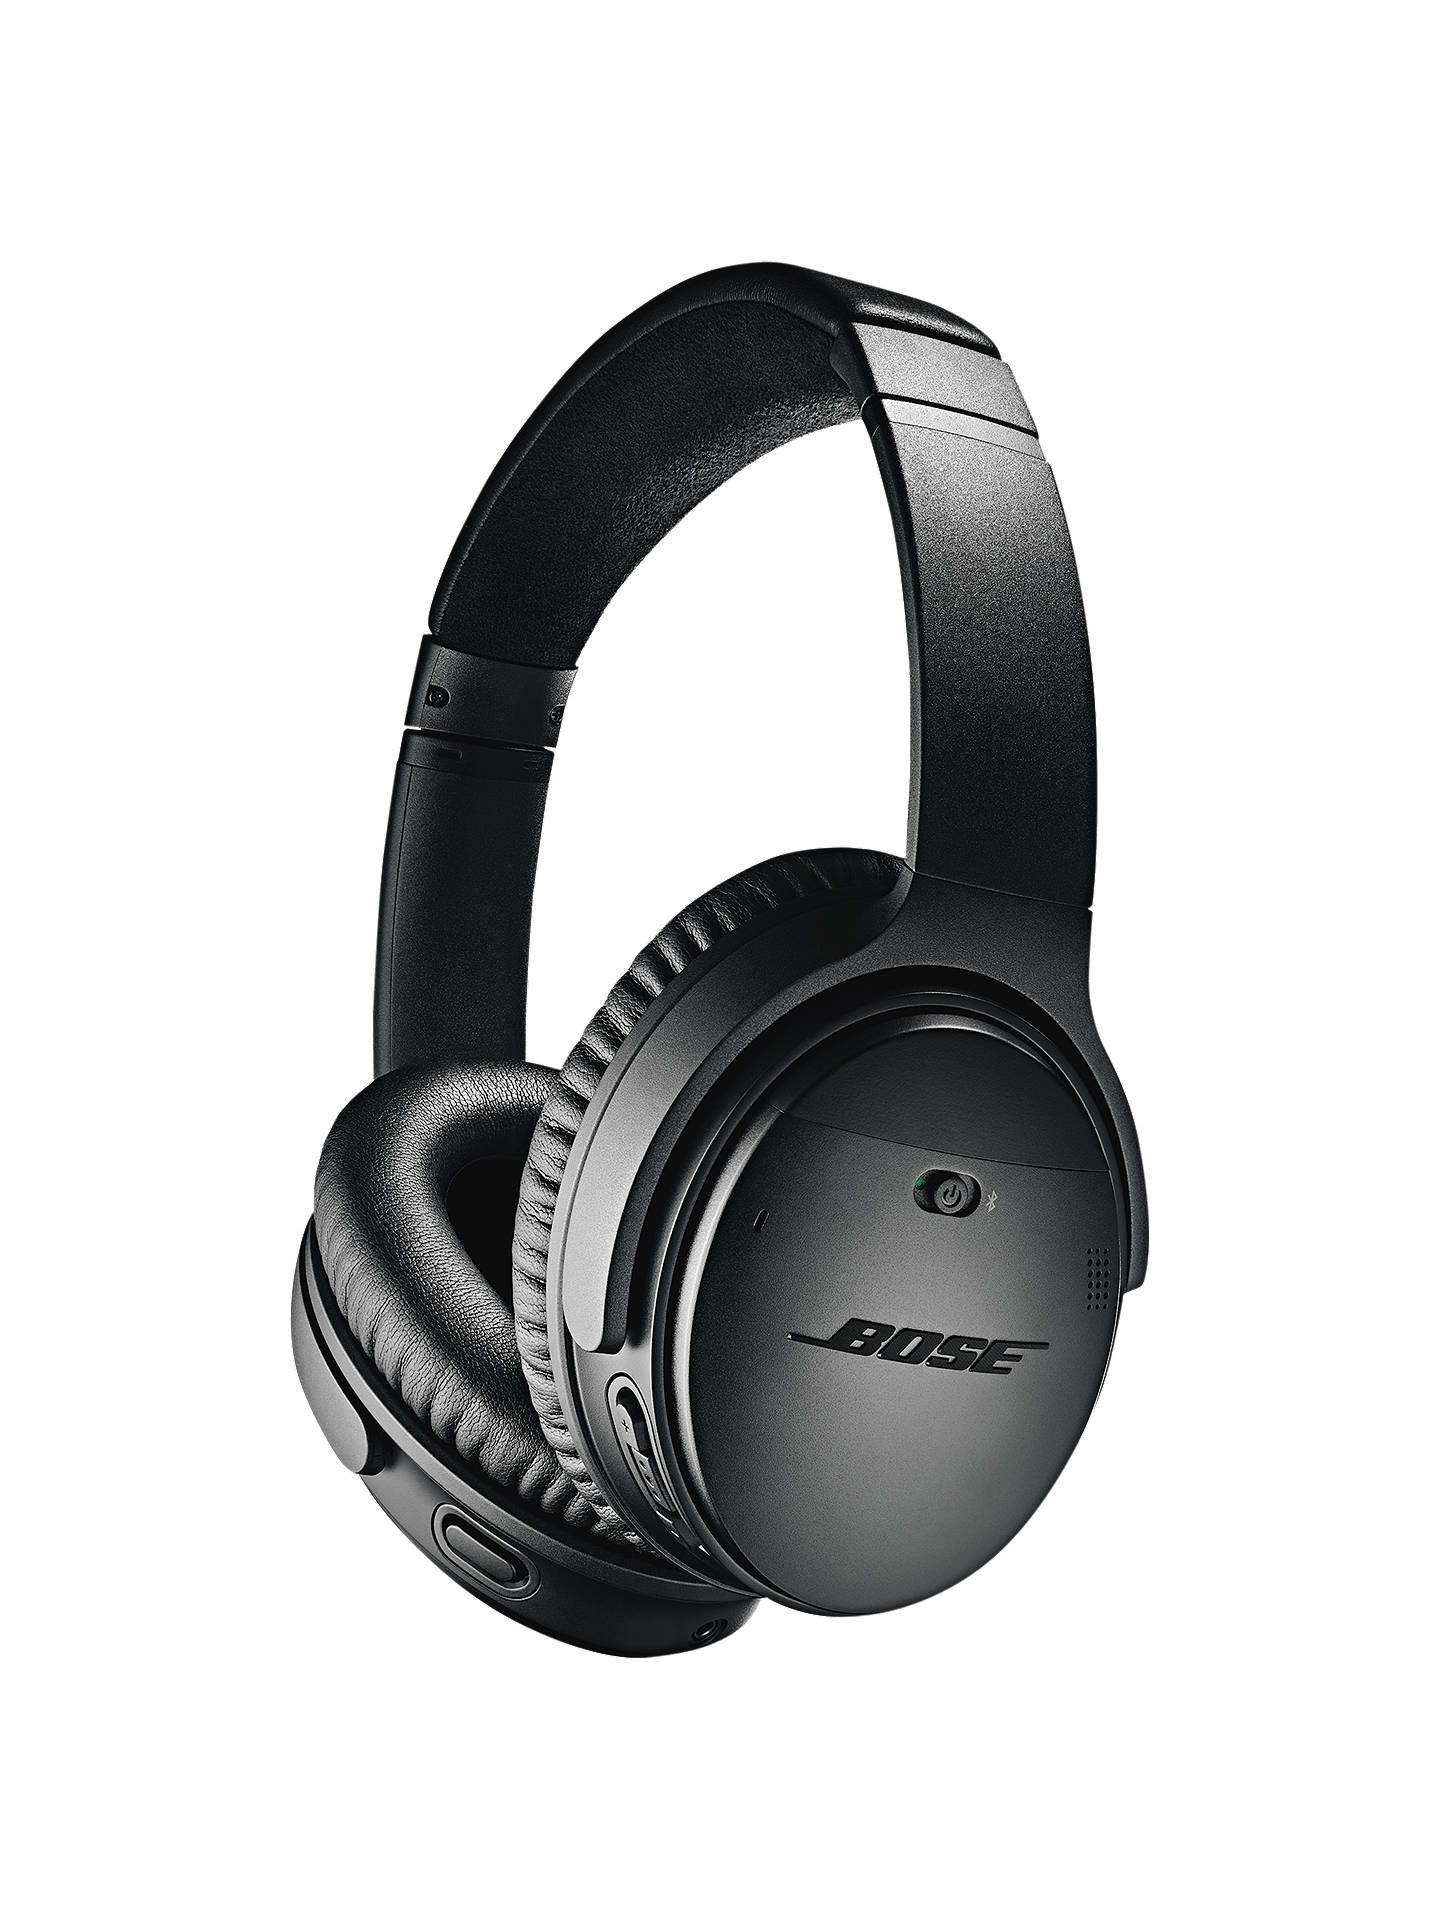 Bose QC35 Series II Black ANC Headphones £219 @ Hills